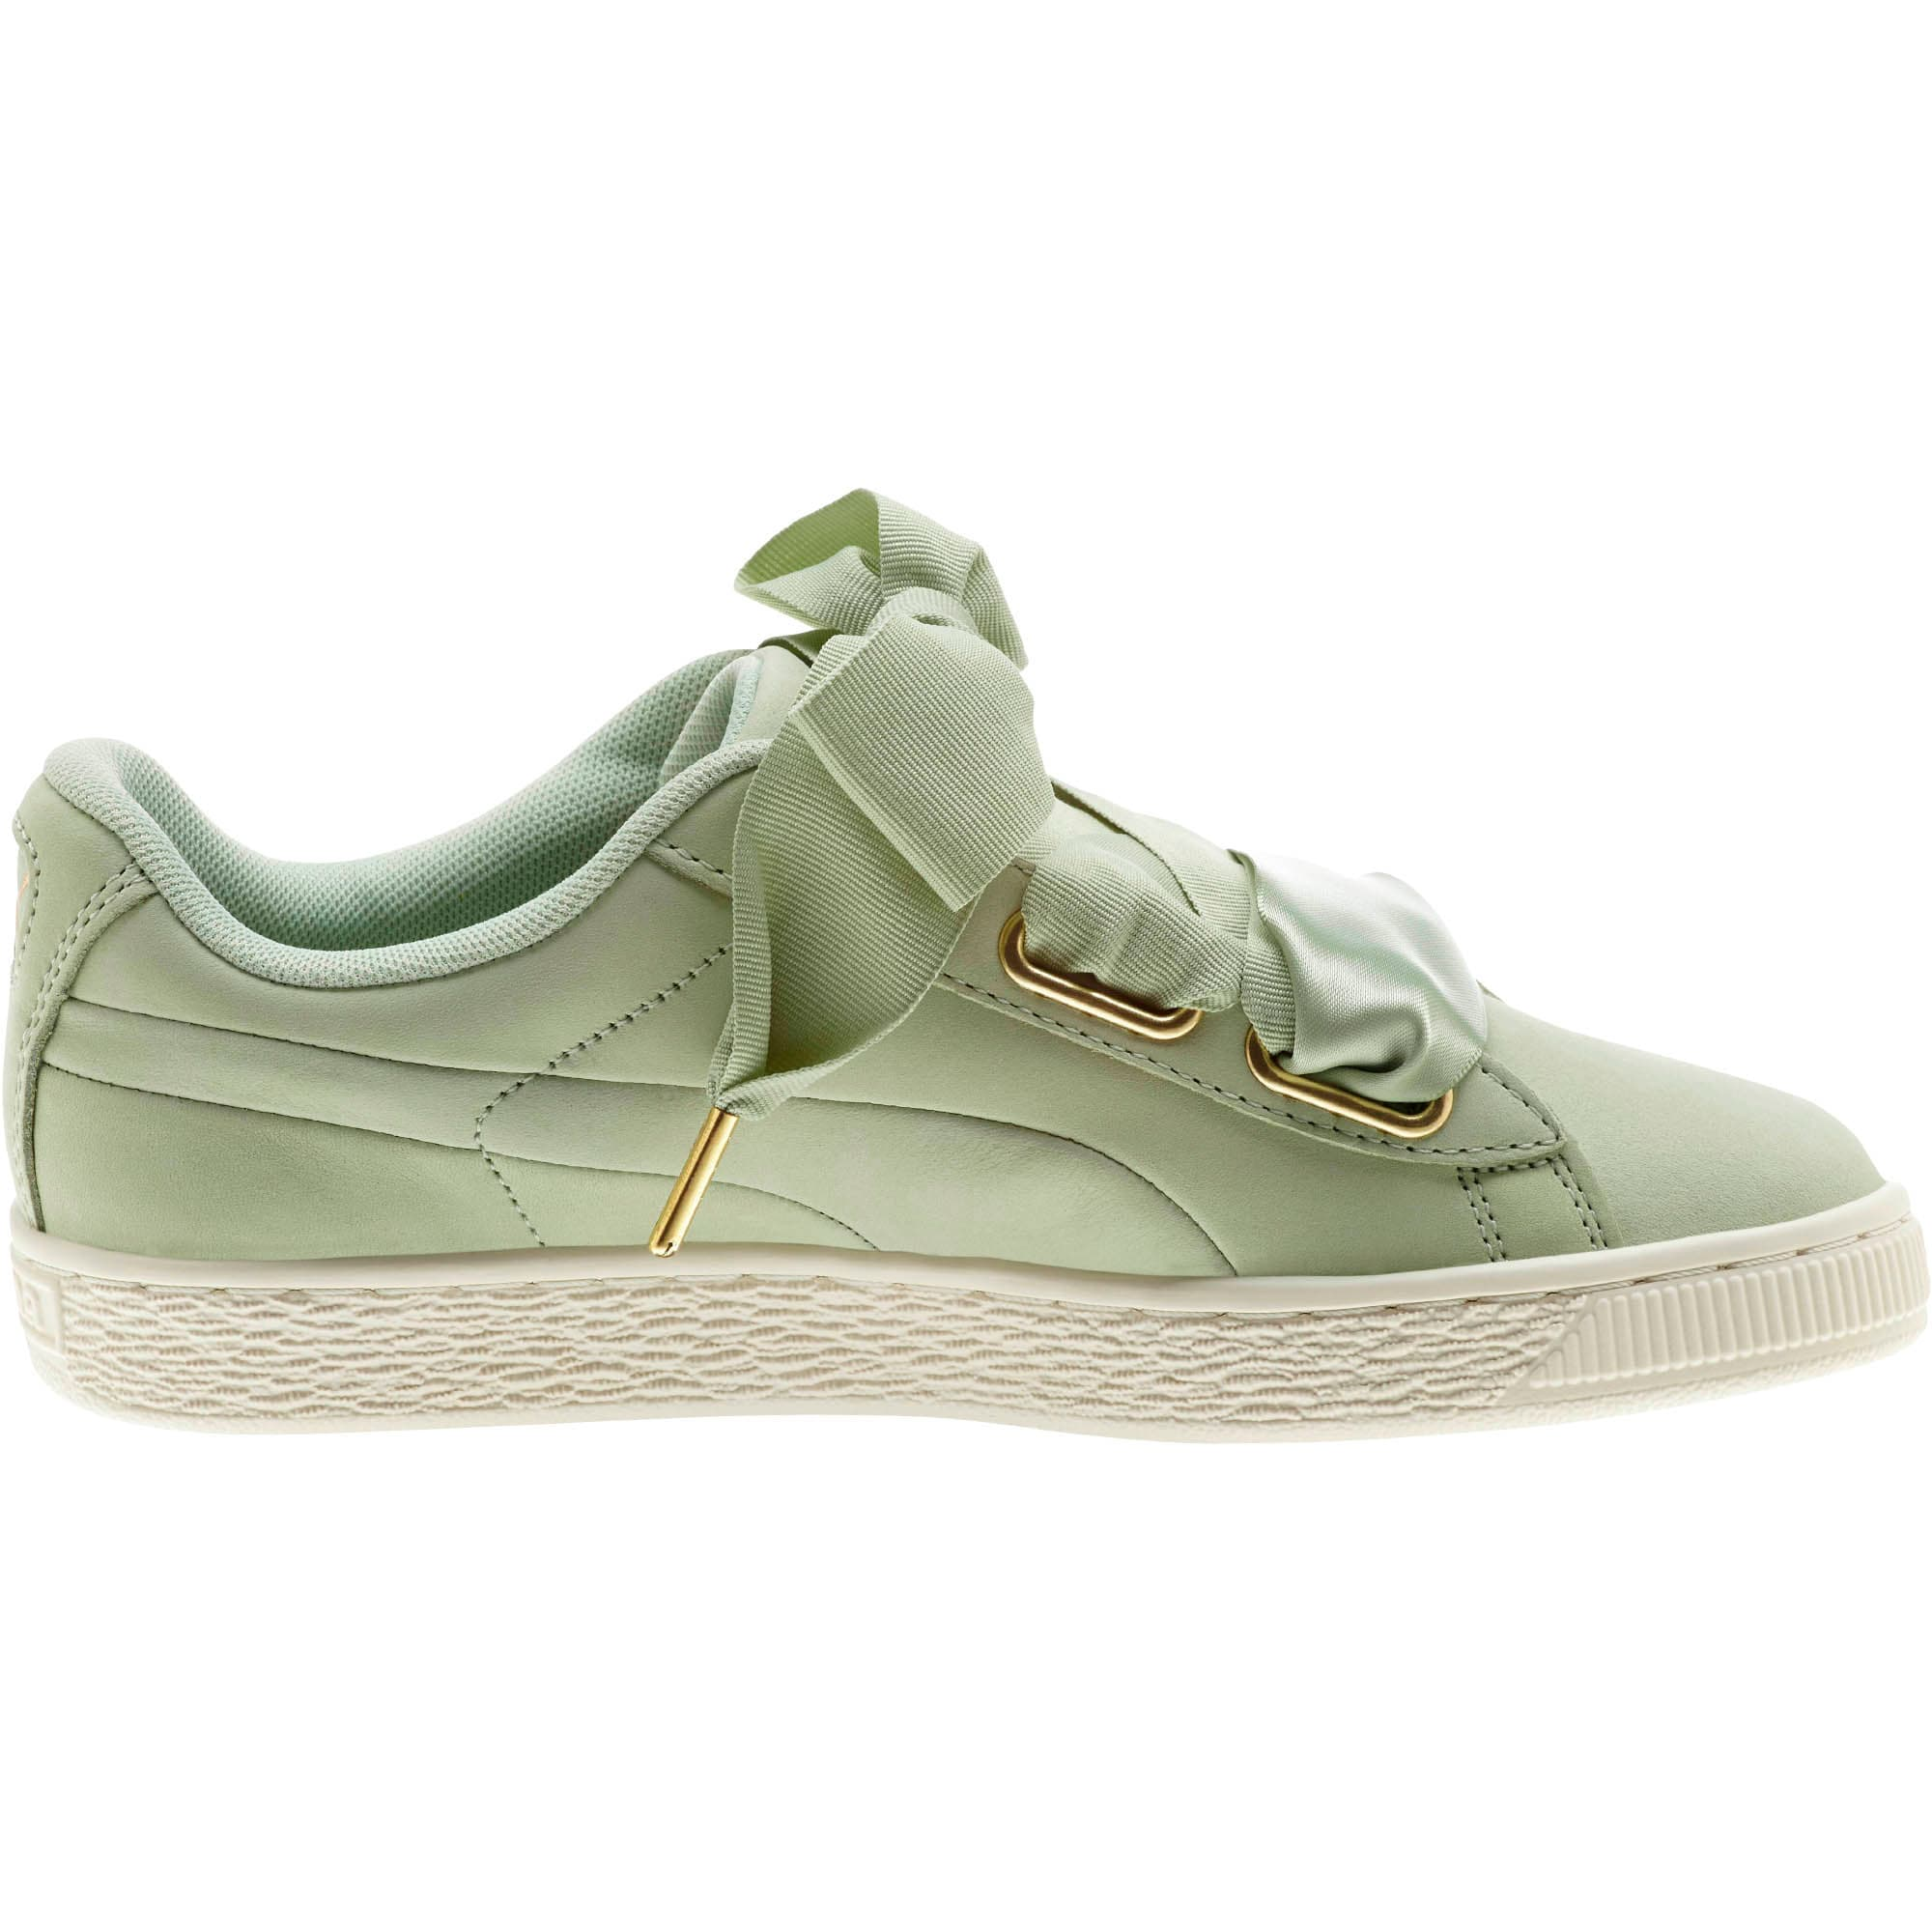 Thumbnail 4 of Basket Heart Soft Women's Sneakers, Smoke Green-Marshmallow, medium